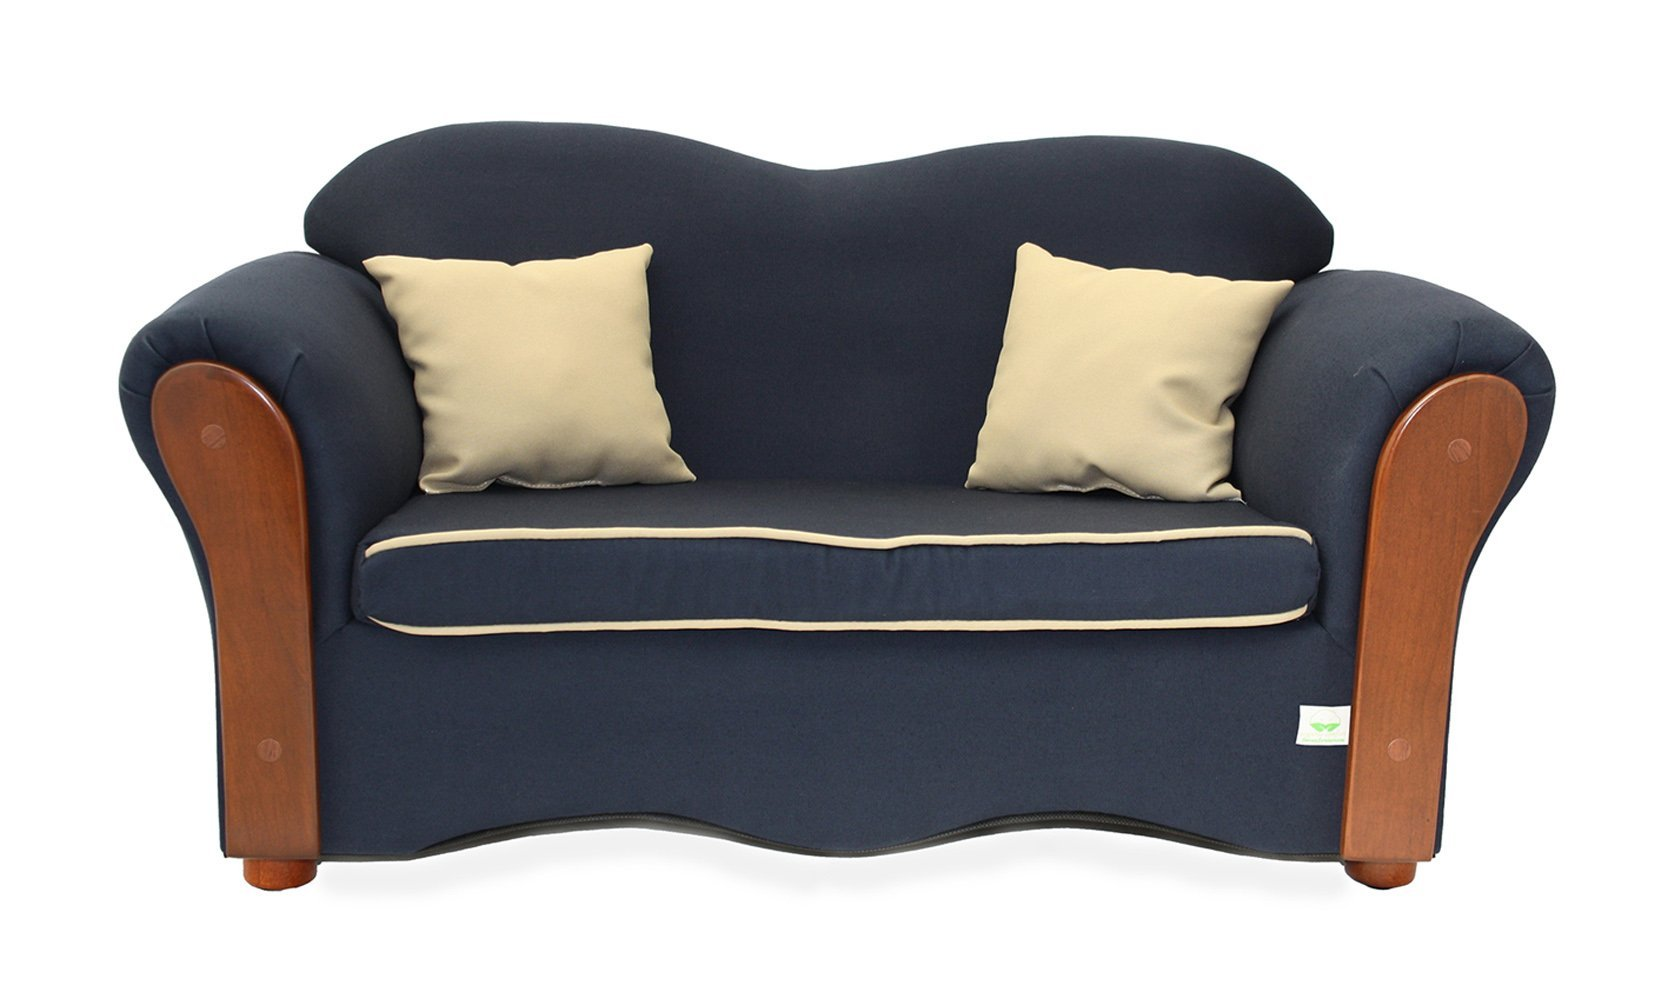 KEET Homey VIP Organic Kid's Sofa, Navy Blue